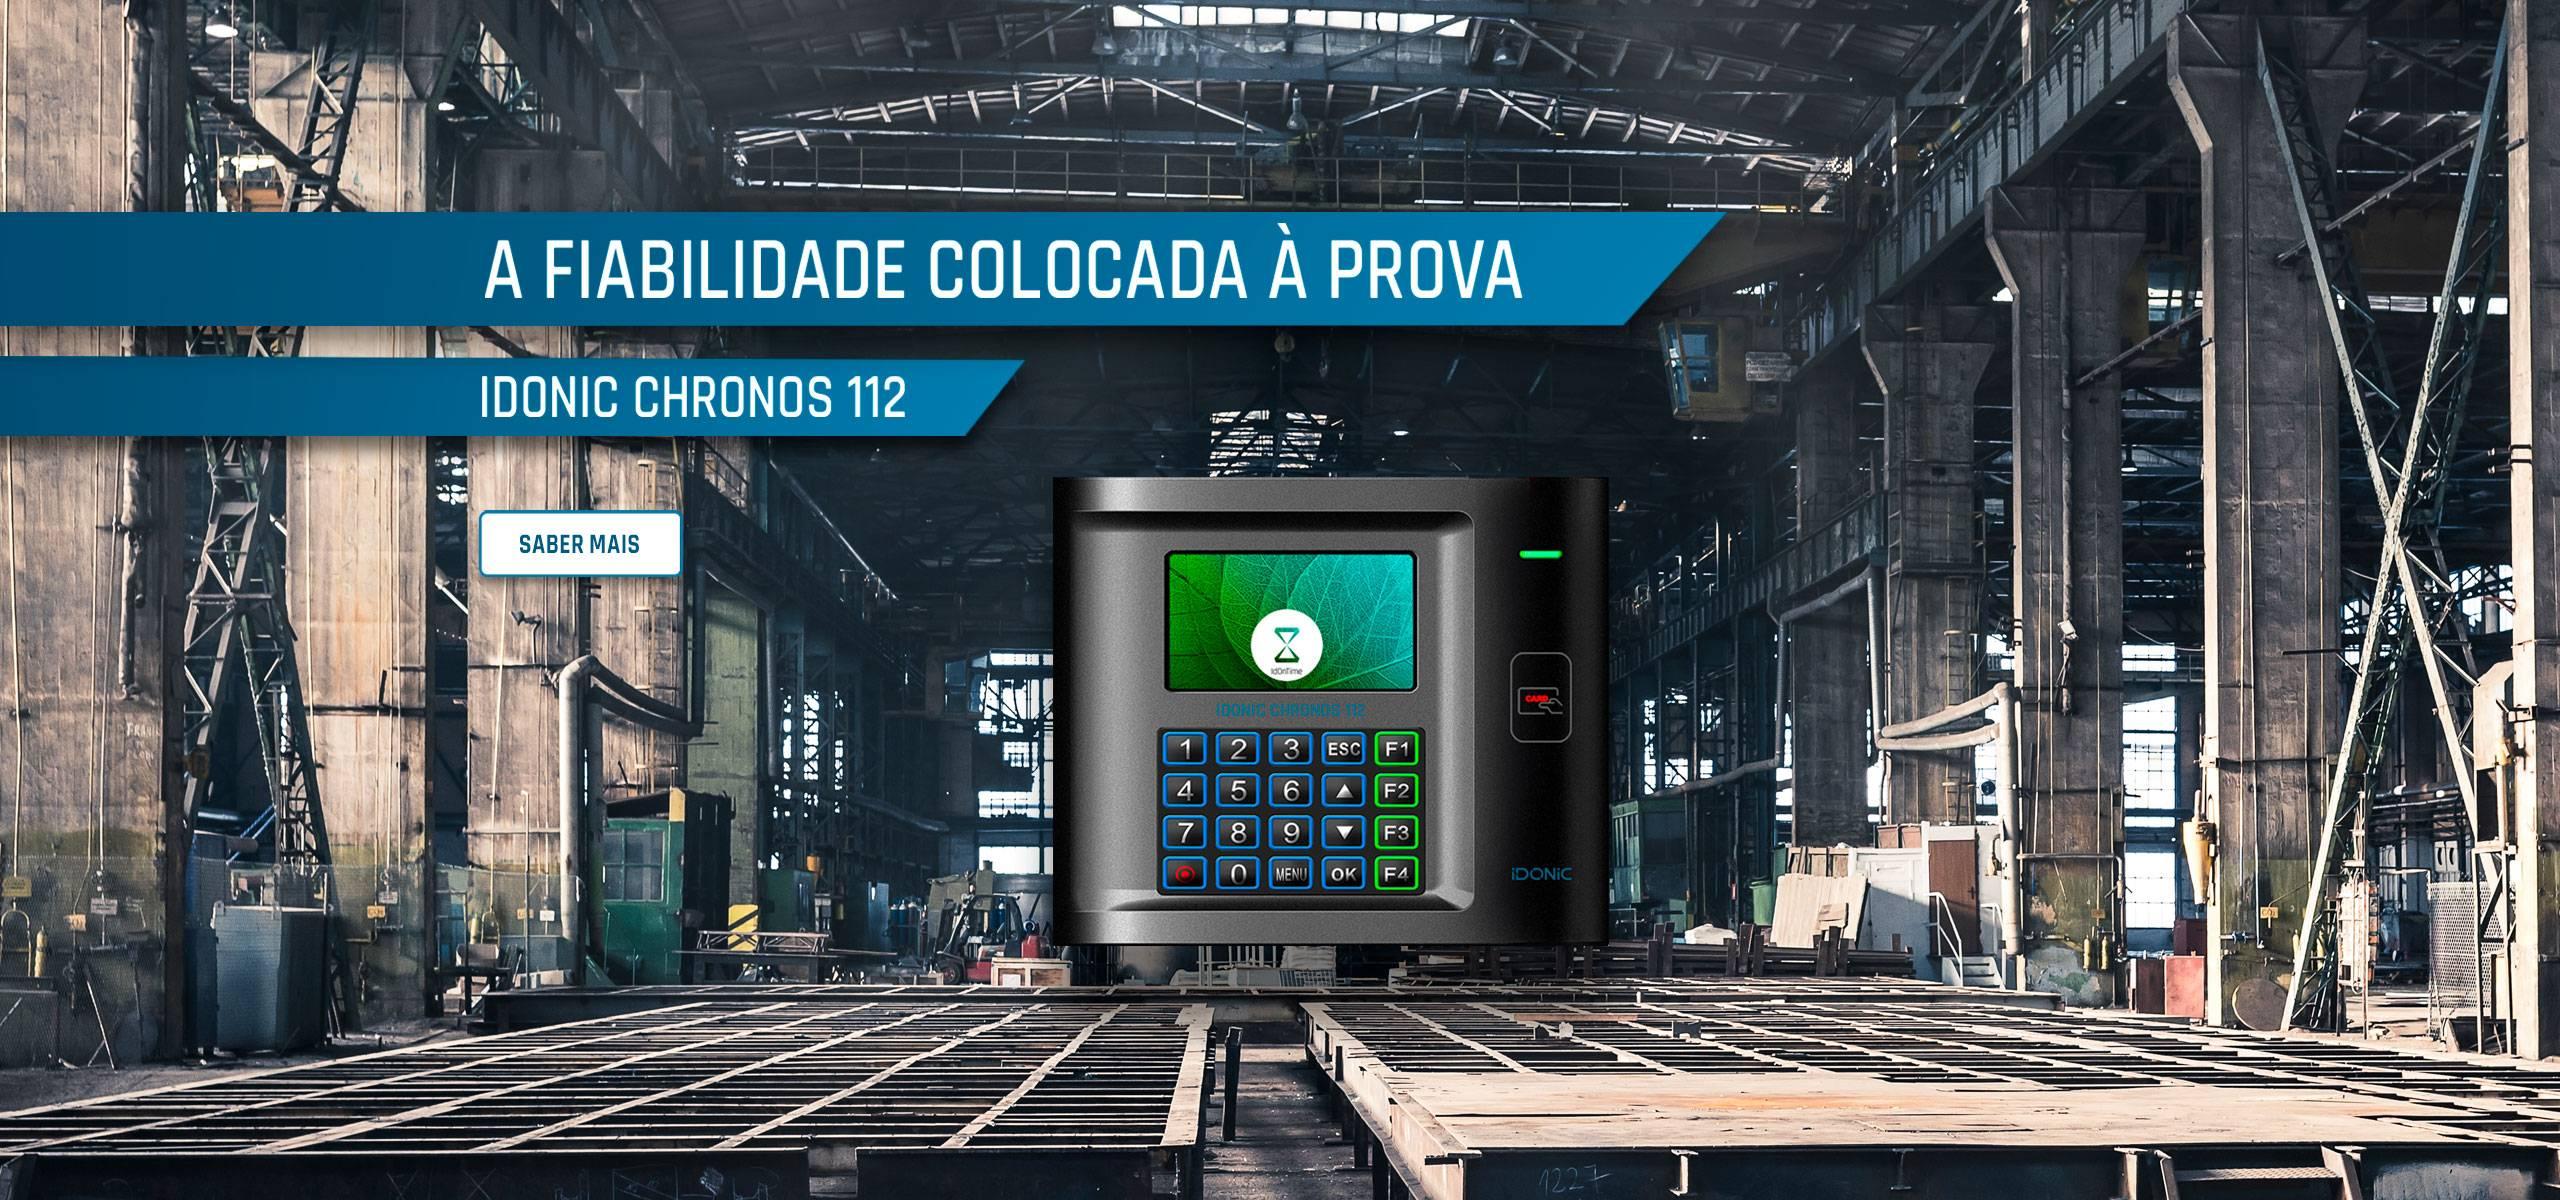 destaque-homepage-idonic-chronos-112